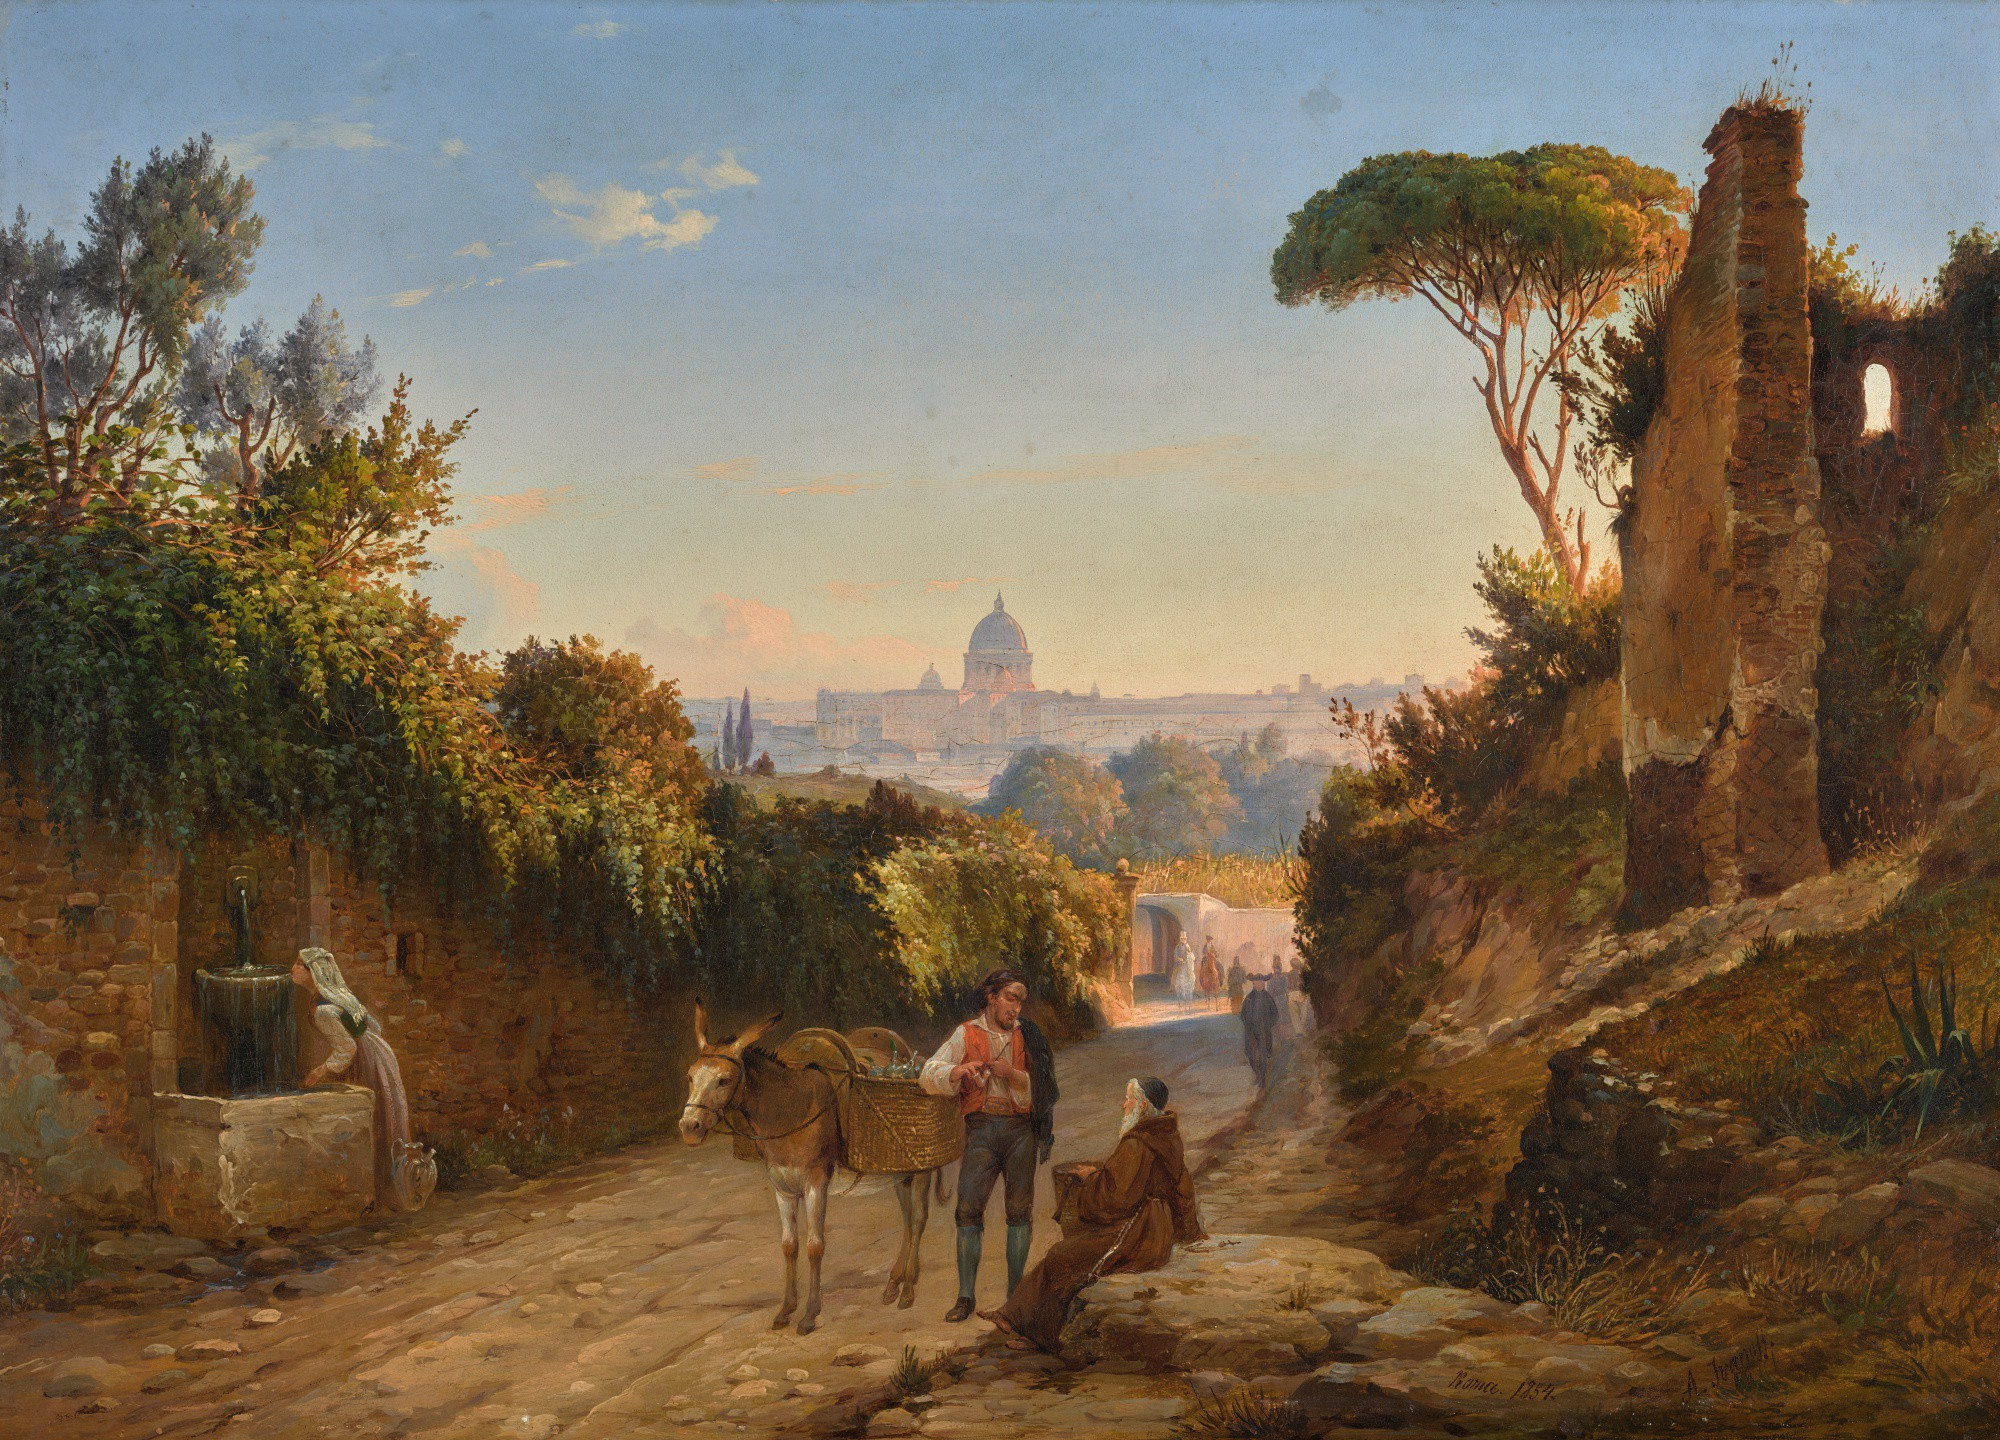 ANTON IVANOVICH IVANOV | ON THE OUTSKIRTS OF ROME